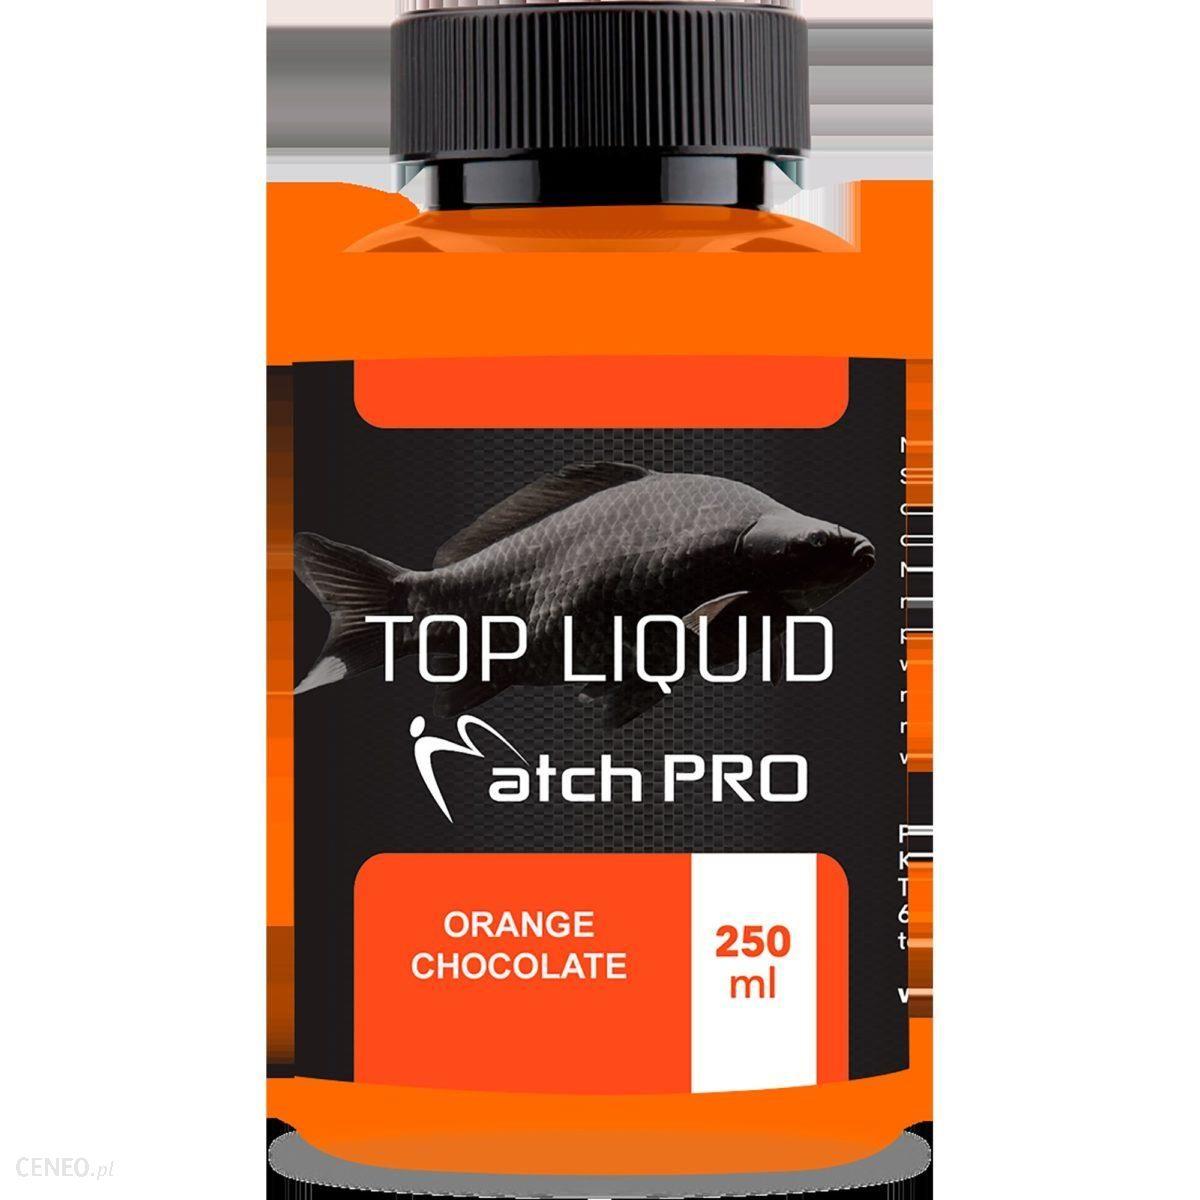 Matchpro Top Liquid Orange Chcolate 250Ml